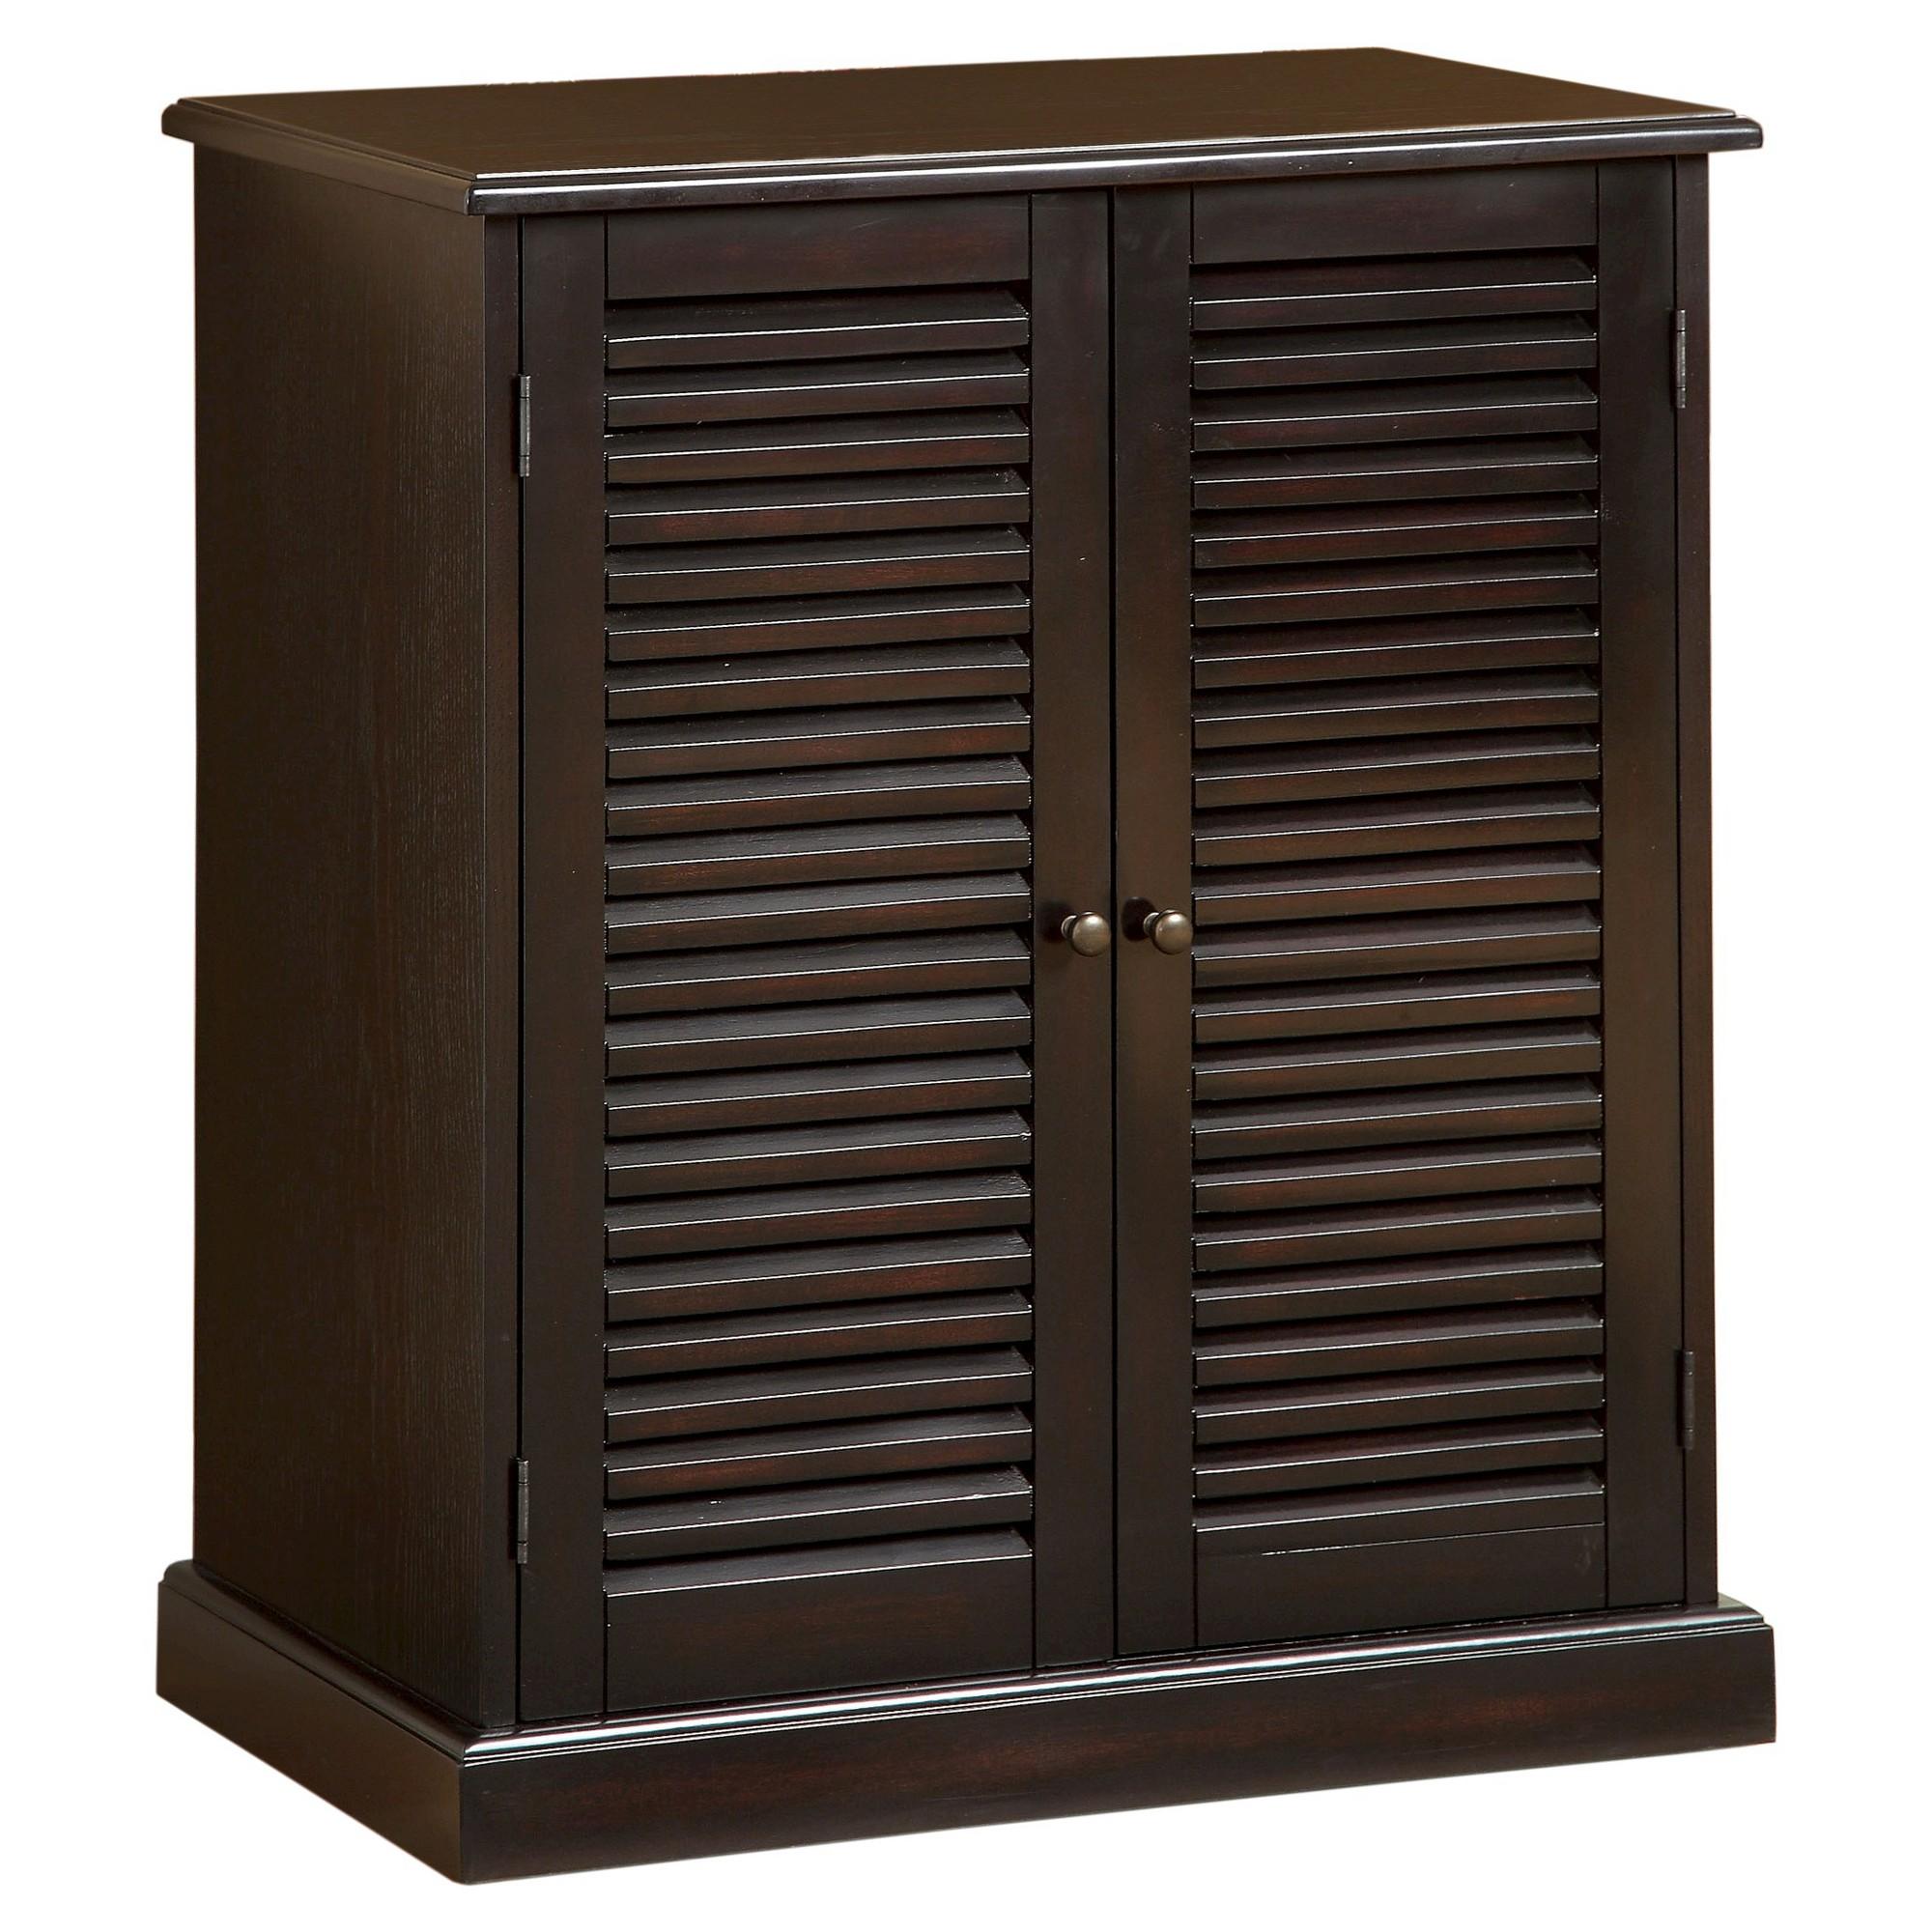 Mibasics 5 Shelf Shoe Cabinet Espresso Brown Shoe Cabinet